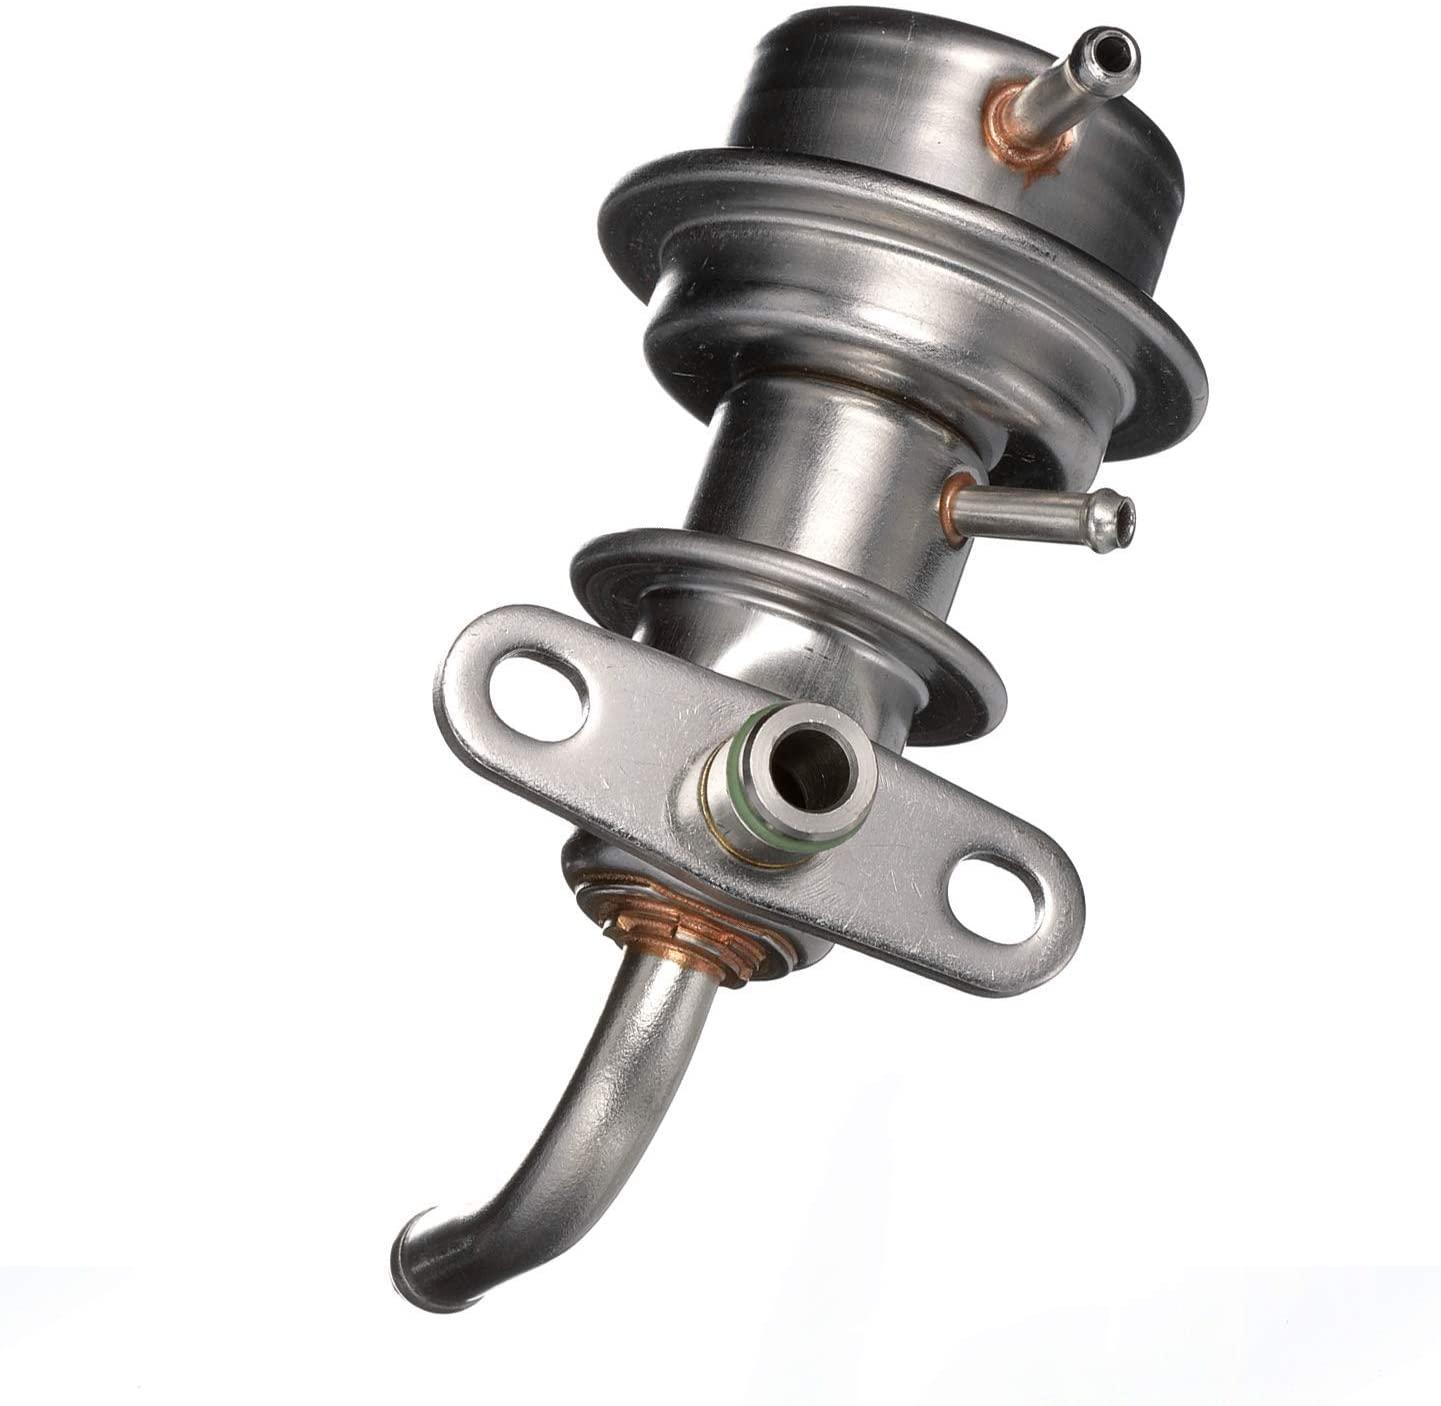 Delphi FP10554 Fuel Pressure Regulator, 1 Pack